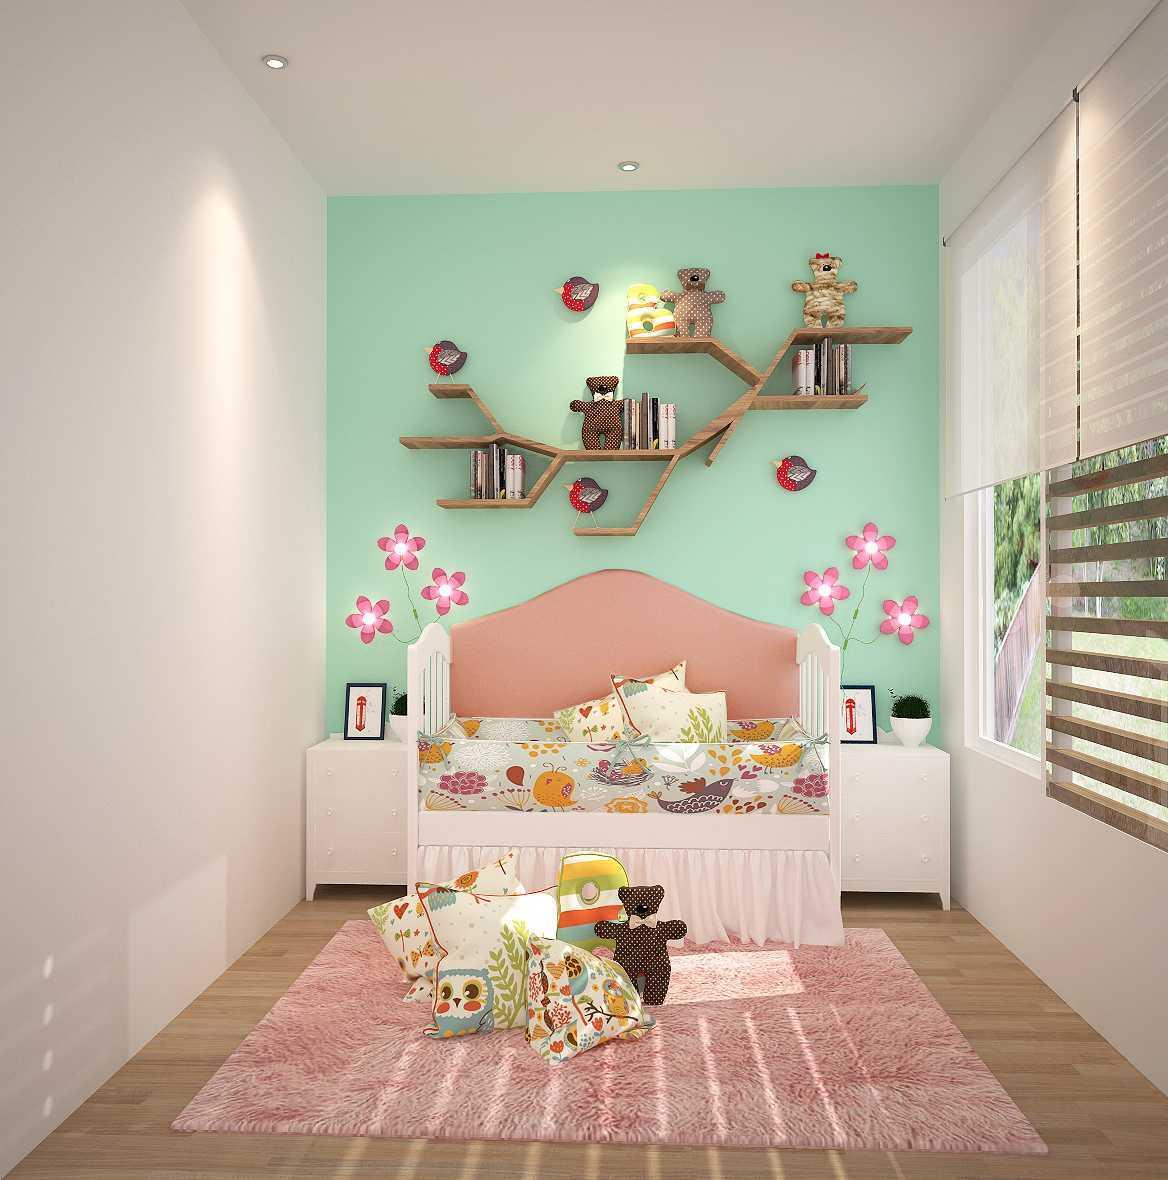 Kaye Interior Design Permata Buana House Daerah Khusus Ibukota Jakarta, Indonesia Daerah Khusus Ibukota Jakarta, Indonesia Kids Bedroom Tropis  48899